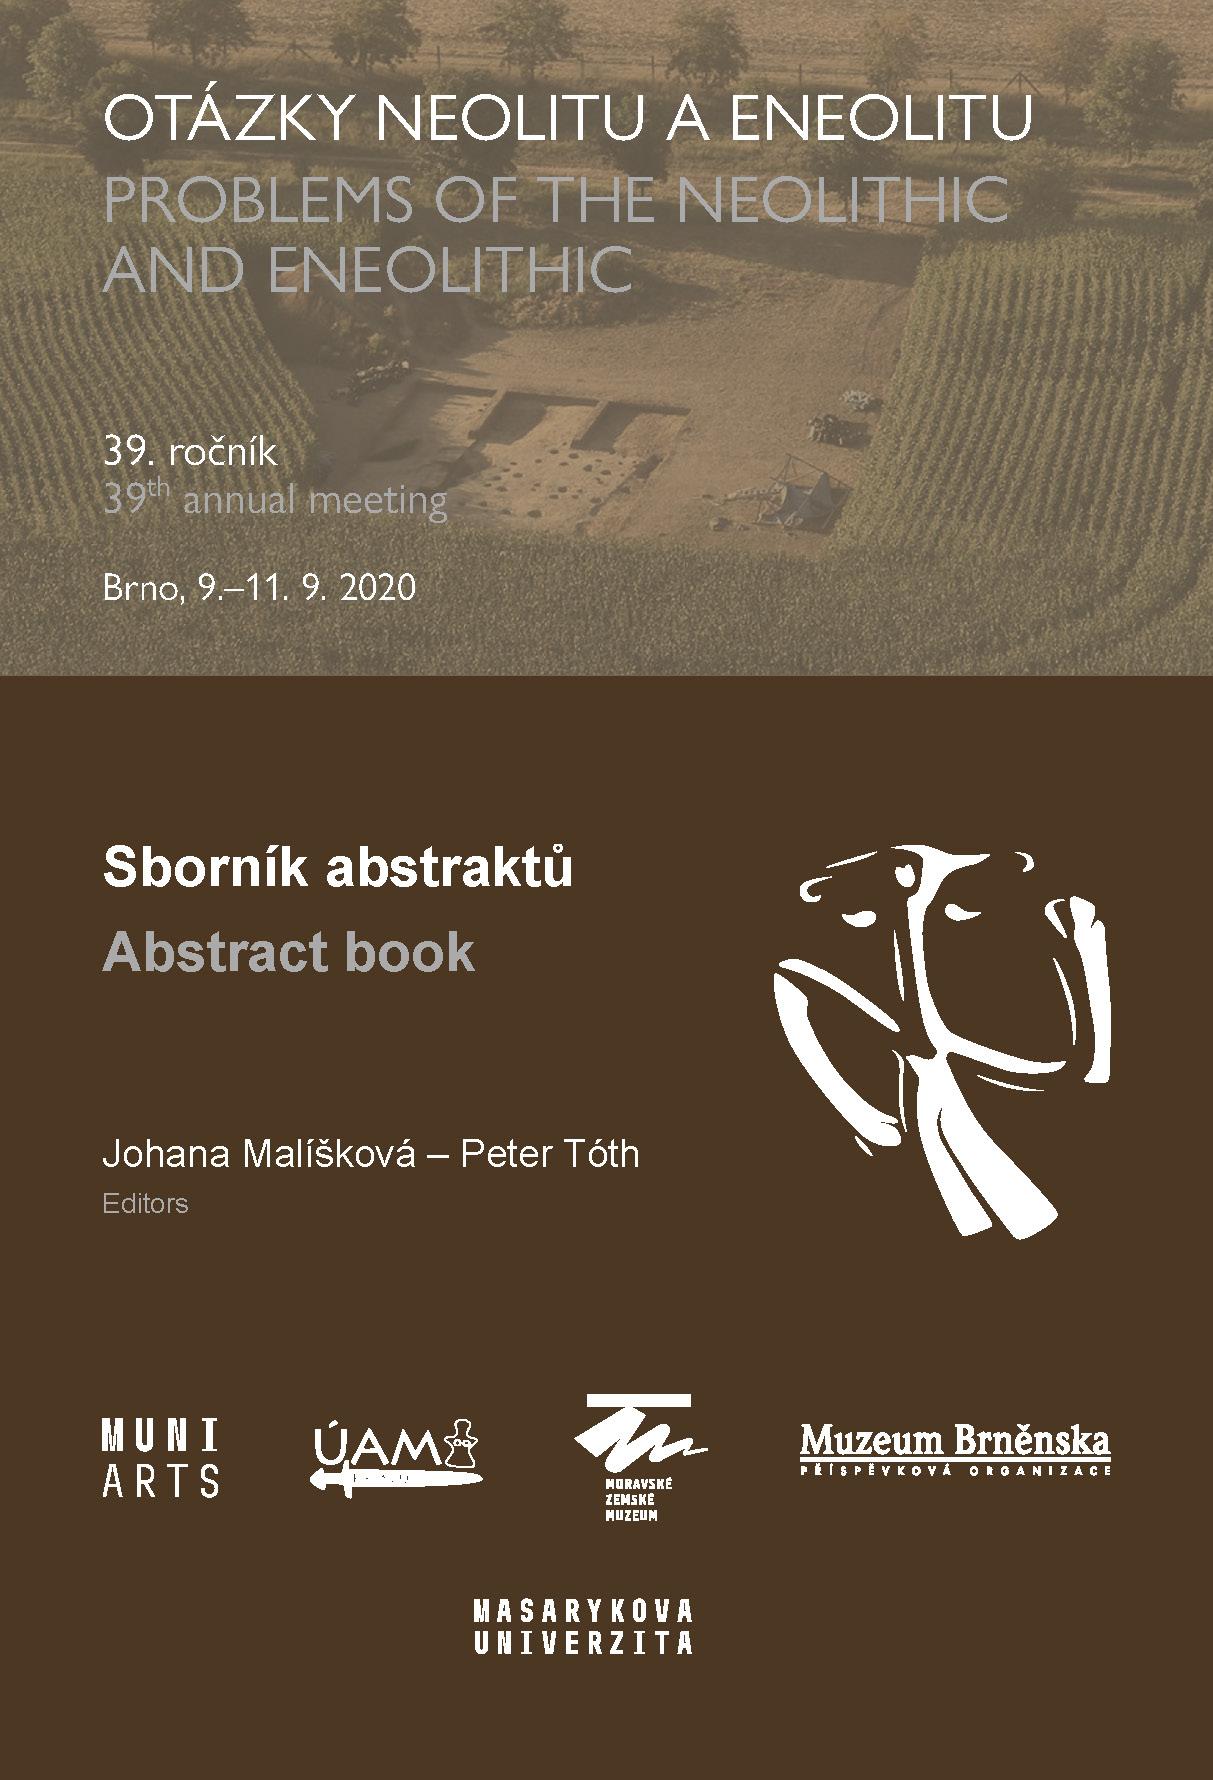 Obálka pro Otázky neolitu a eneolitu. 39. ročník. Brno, 9.–11. 9. 2020. Sborník abstraktů